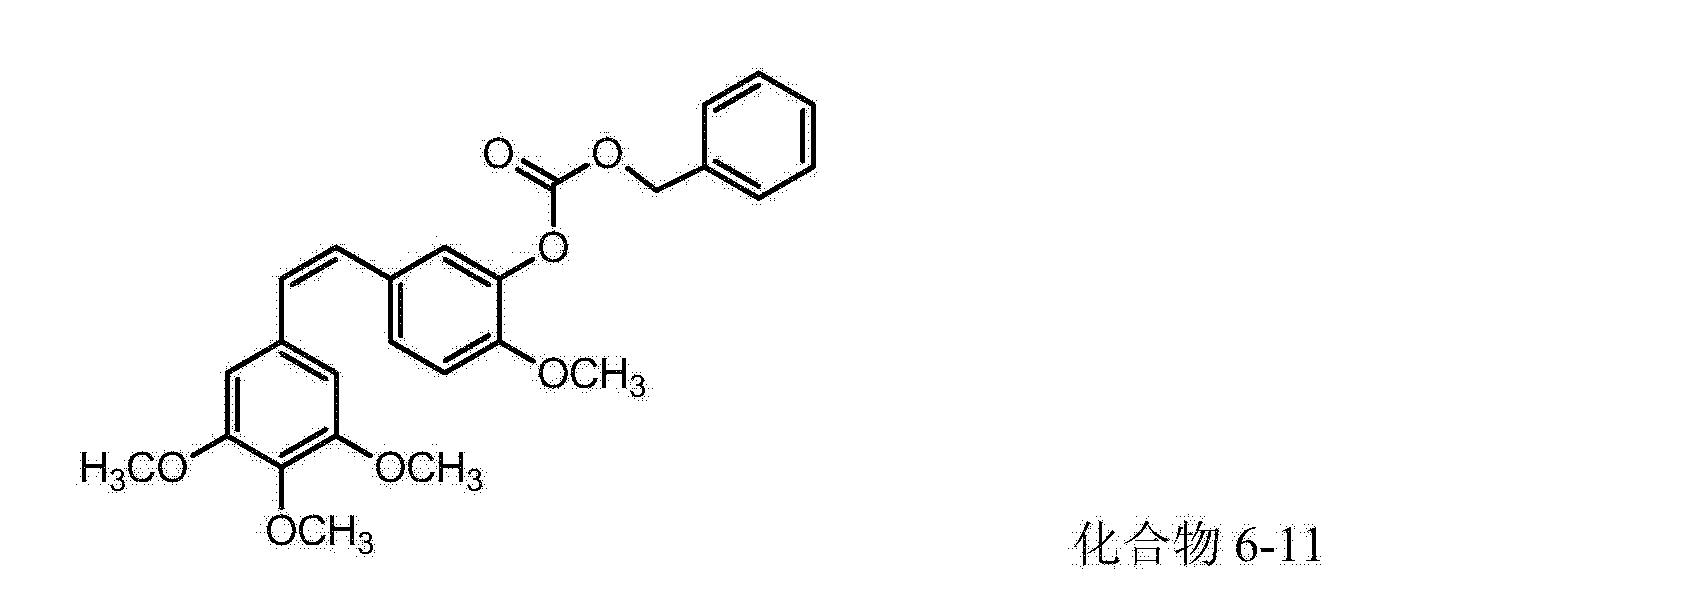 Figure CN103524349AD00142